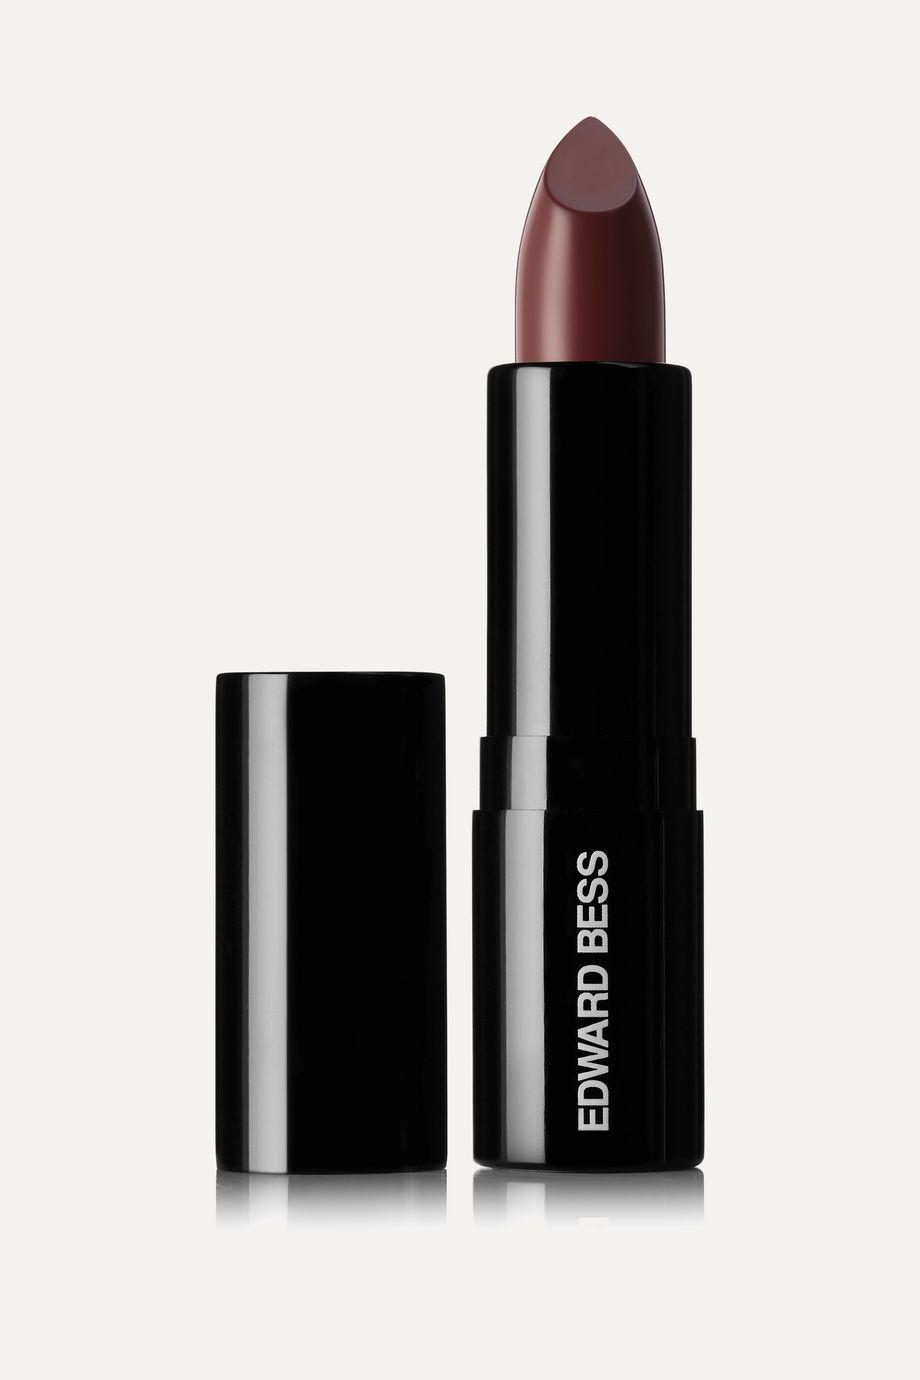 Edward Bess Ultra Slick Lipstick - Wicked Game